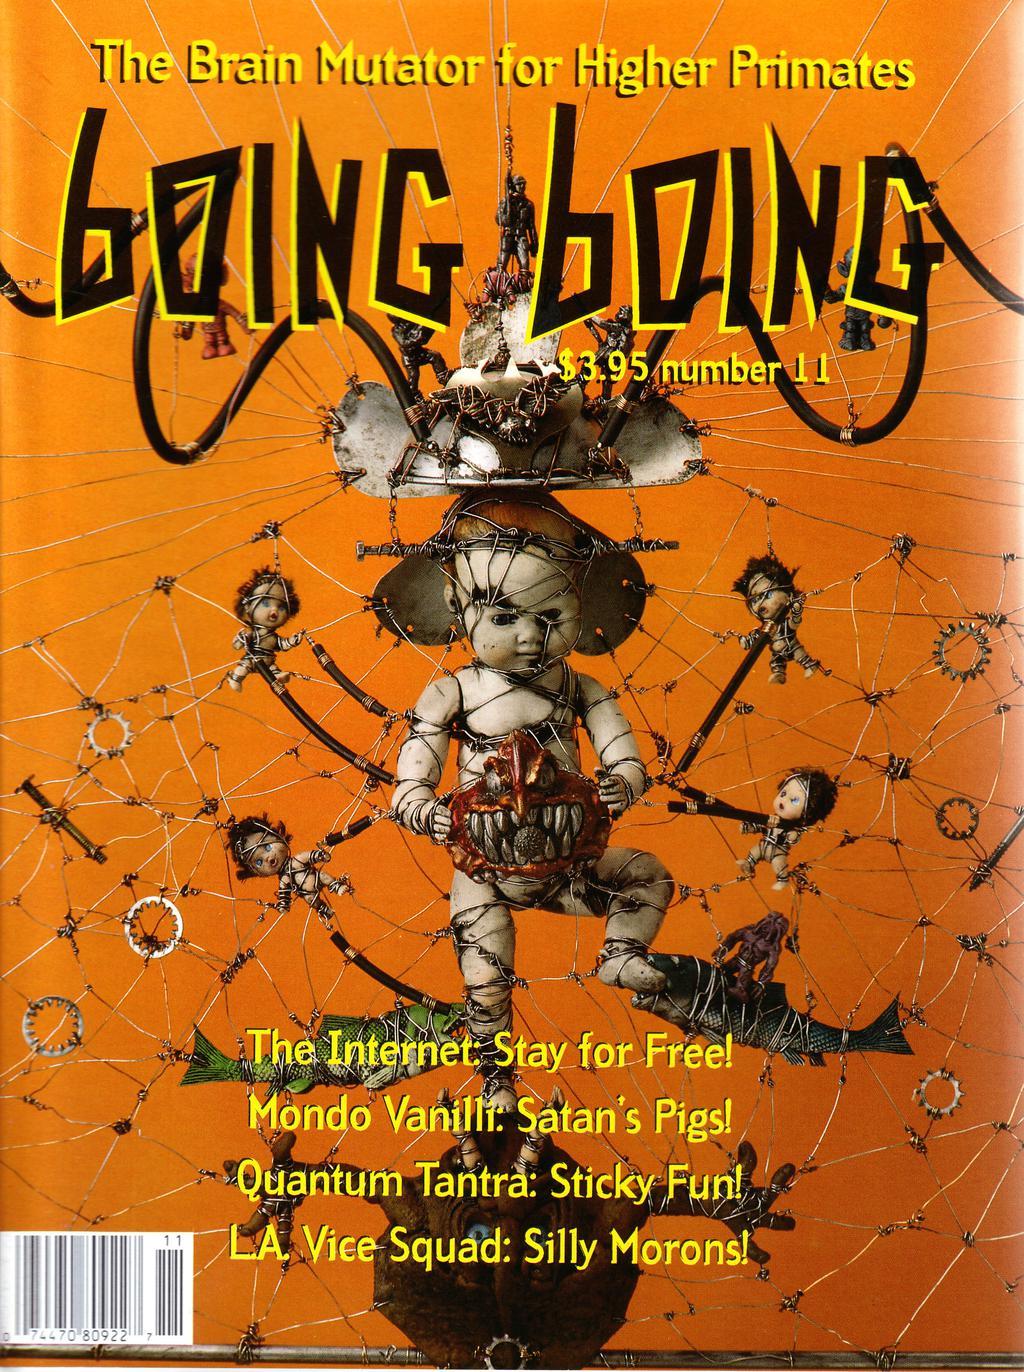 Boing Boing Vol 8